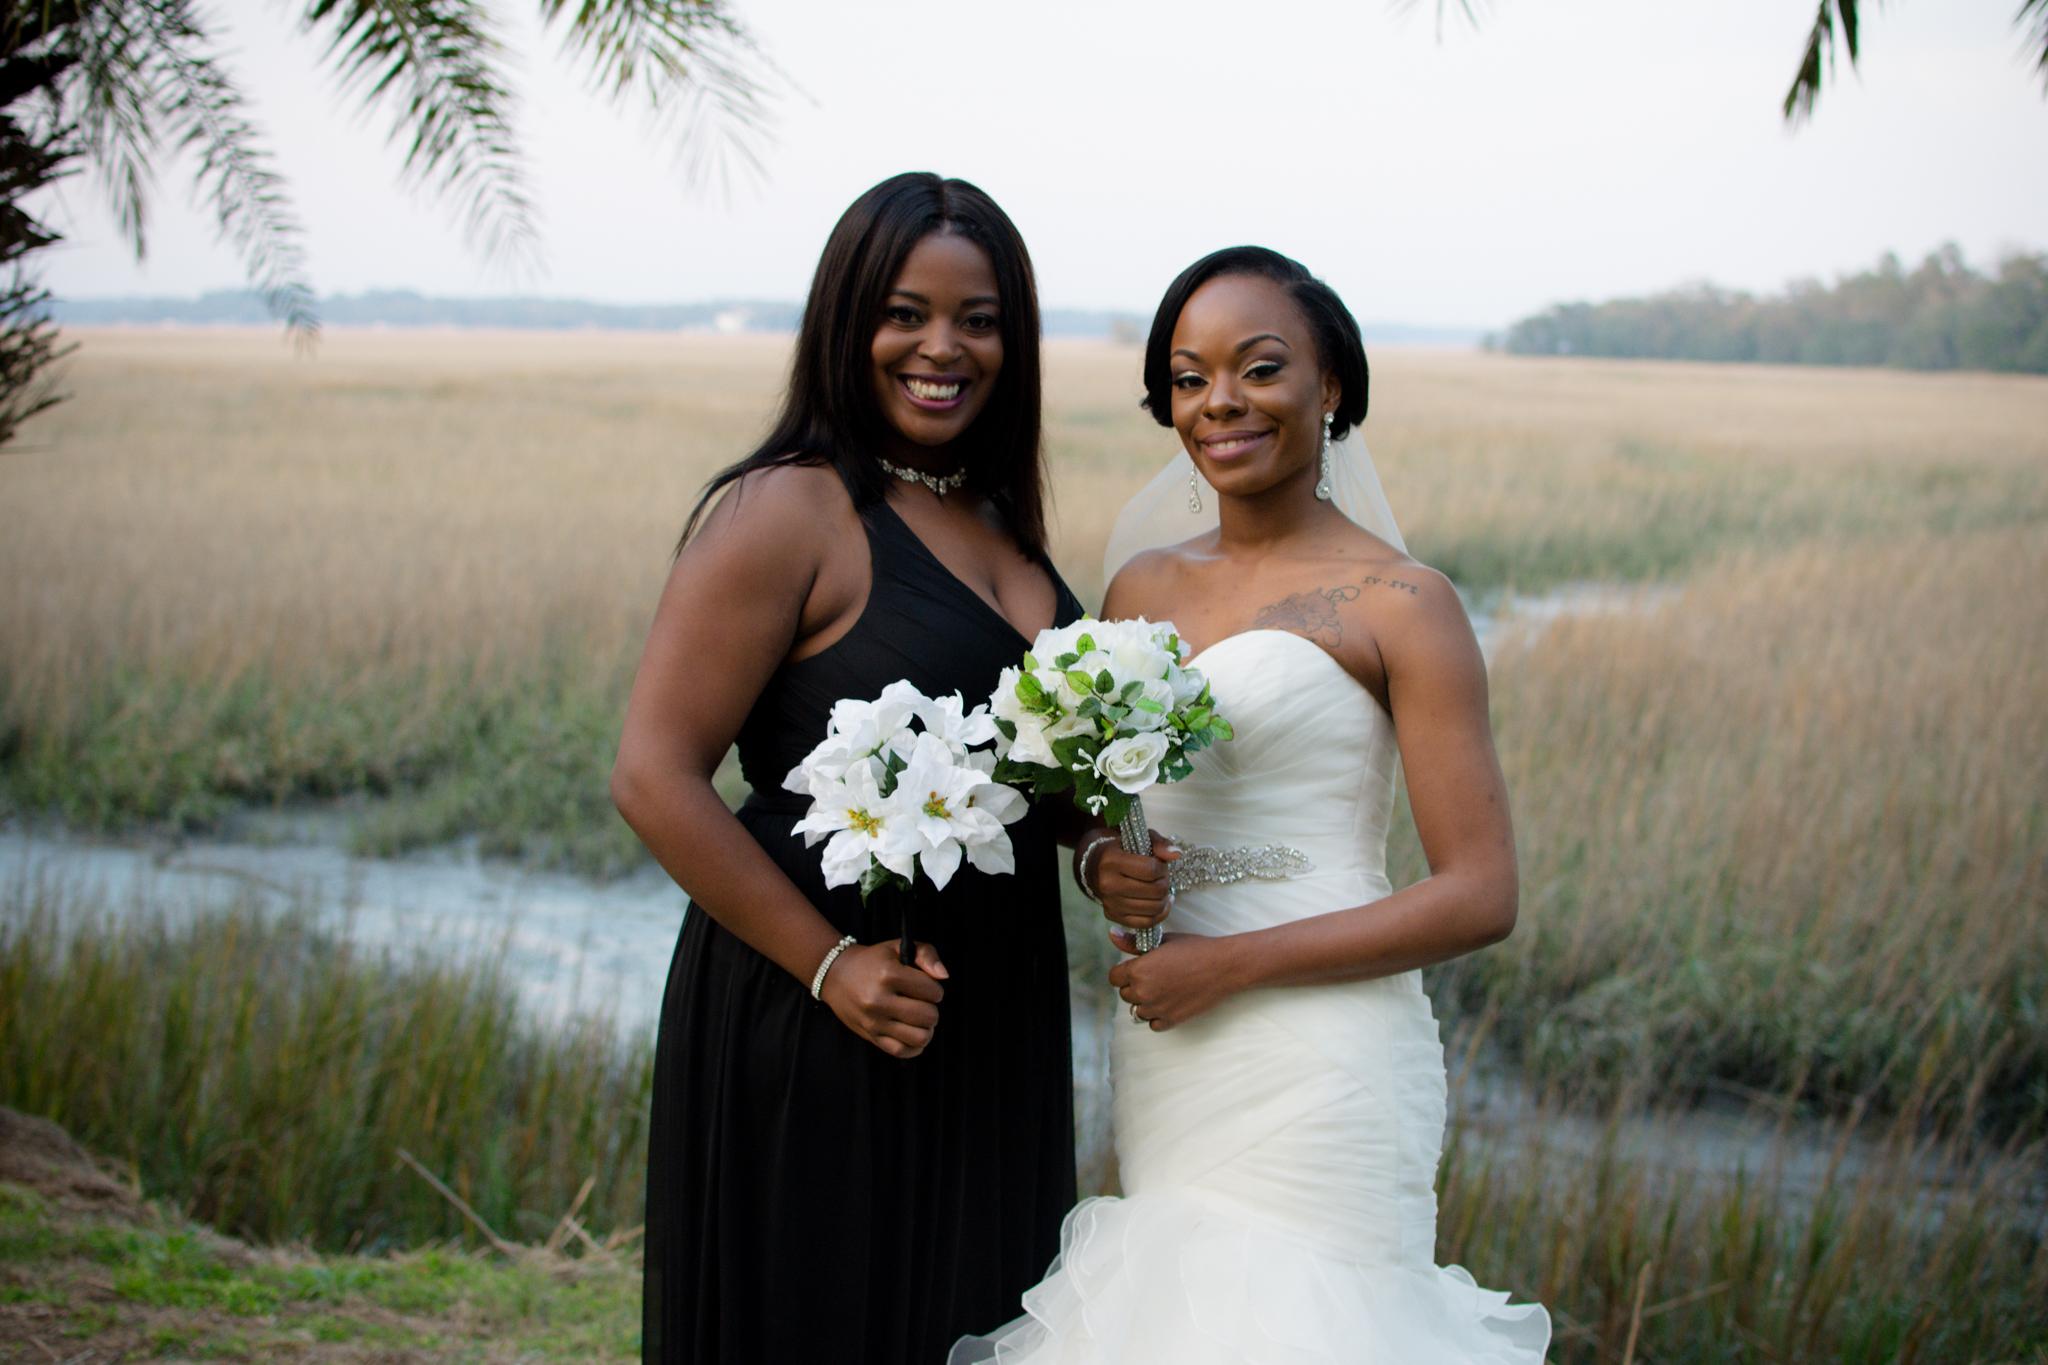 chaplin wedding (98 of 181).JPG